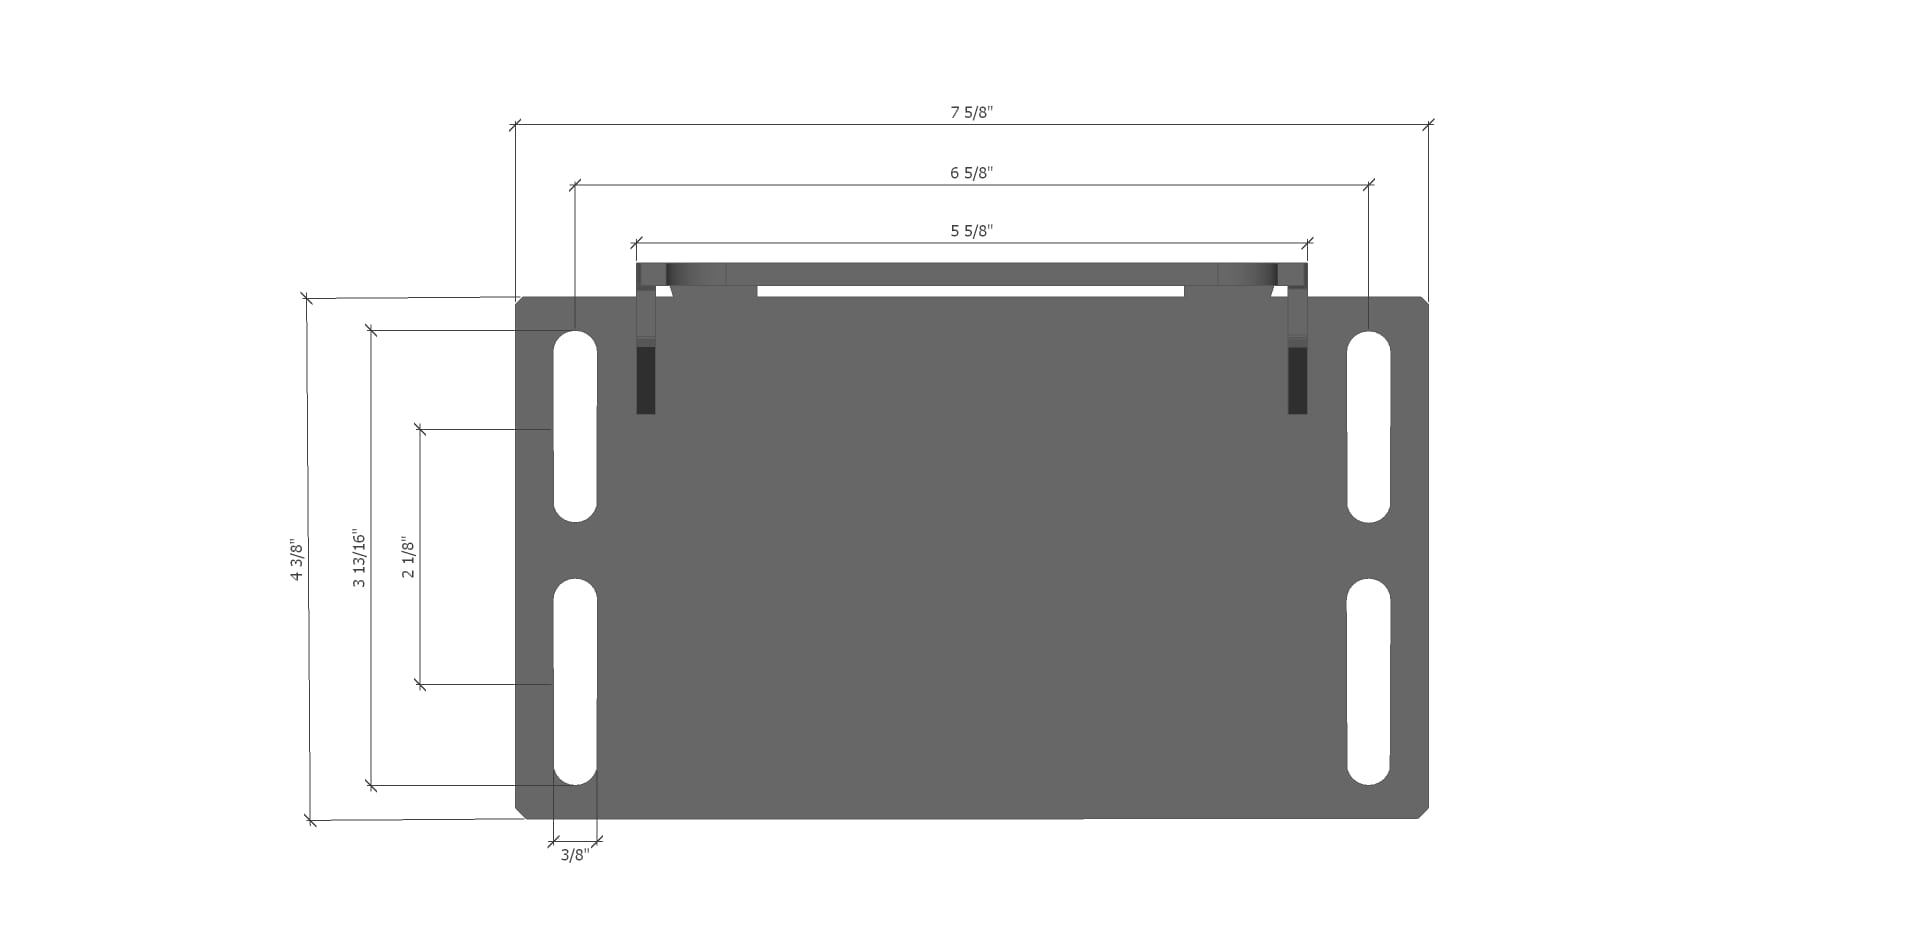 simucube2 servo mount dimensions